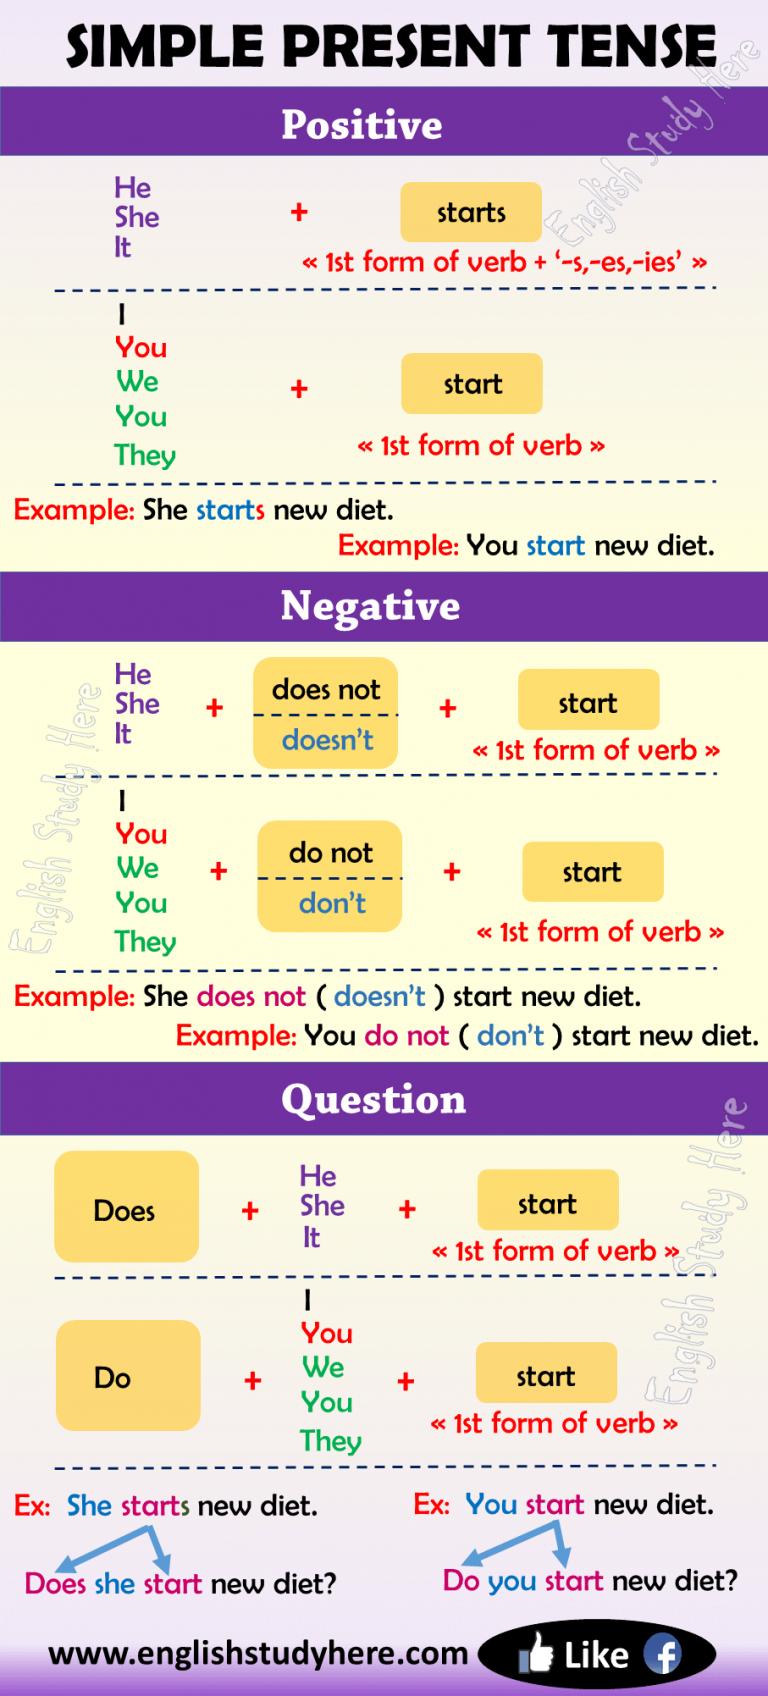 Simple Present Tense In English English Study Here Simple Present Tense Learn English Grammar Easy English Grammar